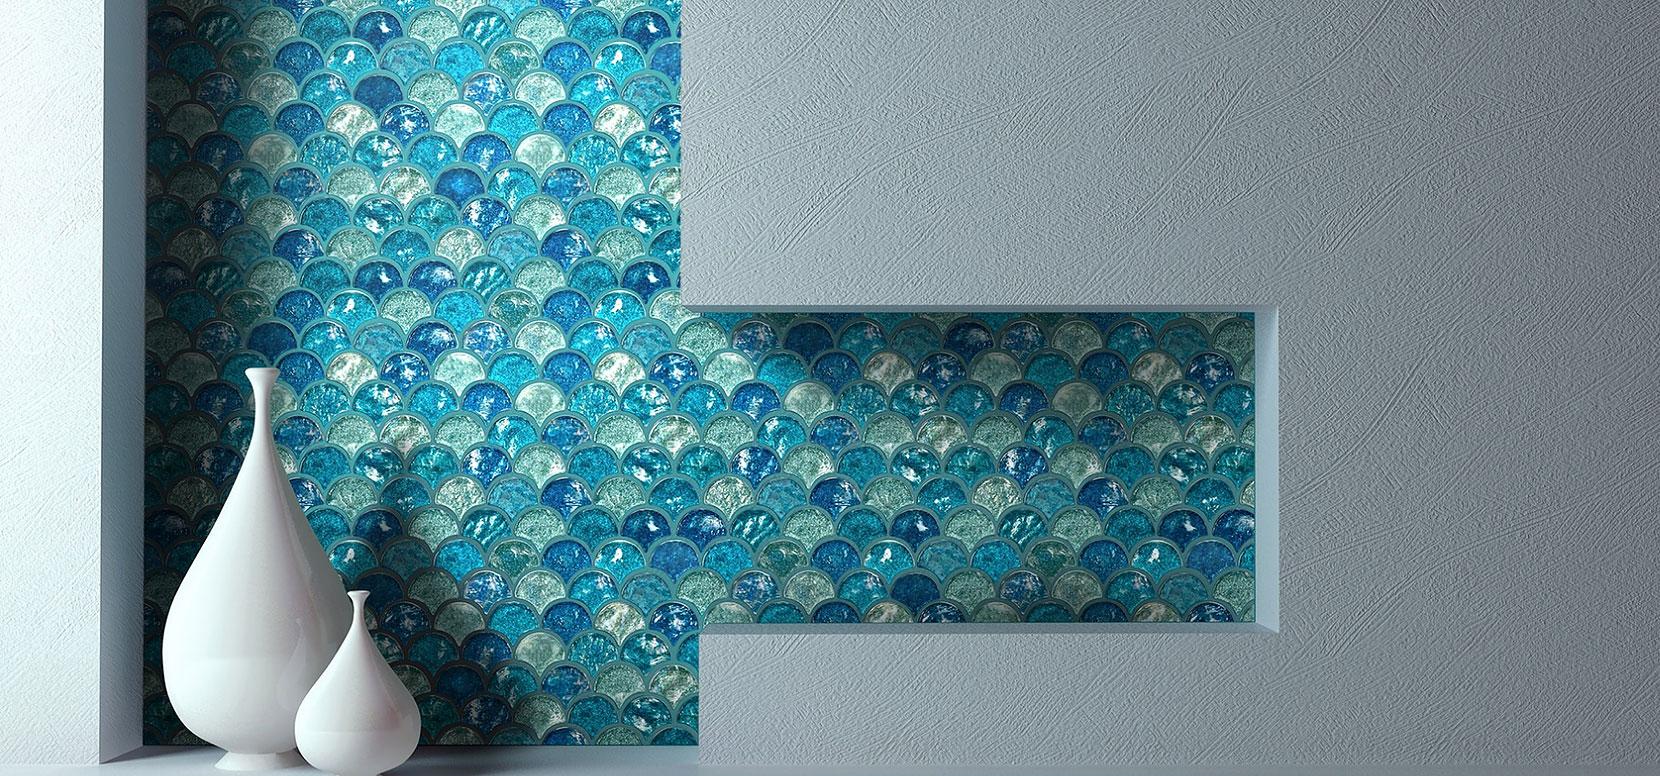 try oasis blue fan iridescent glass